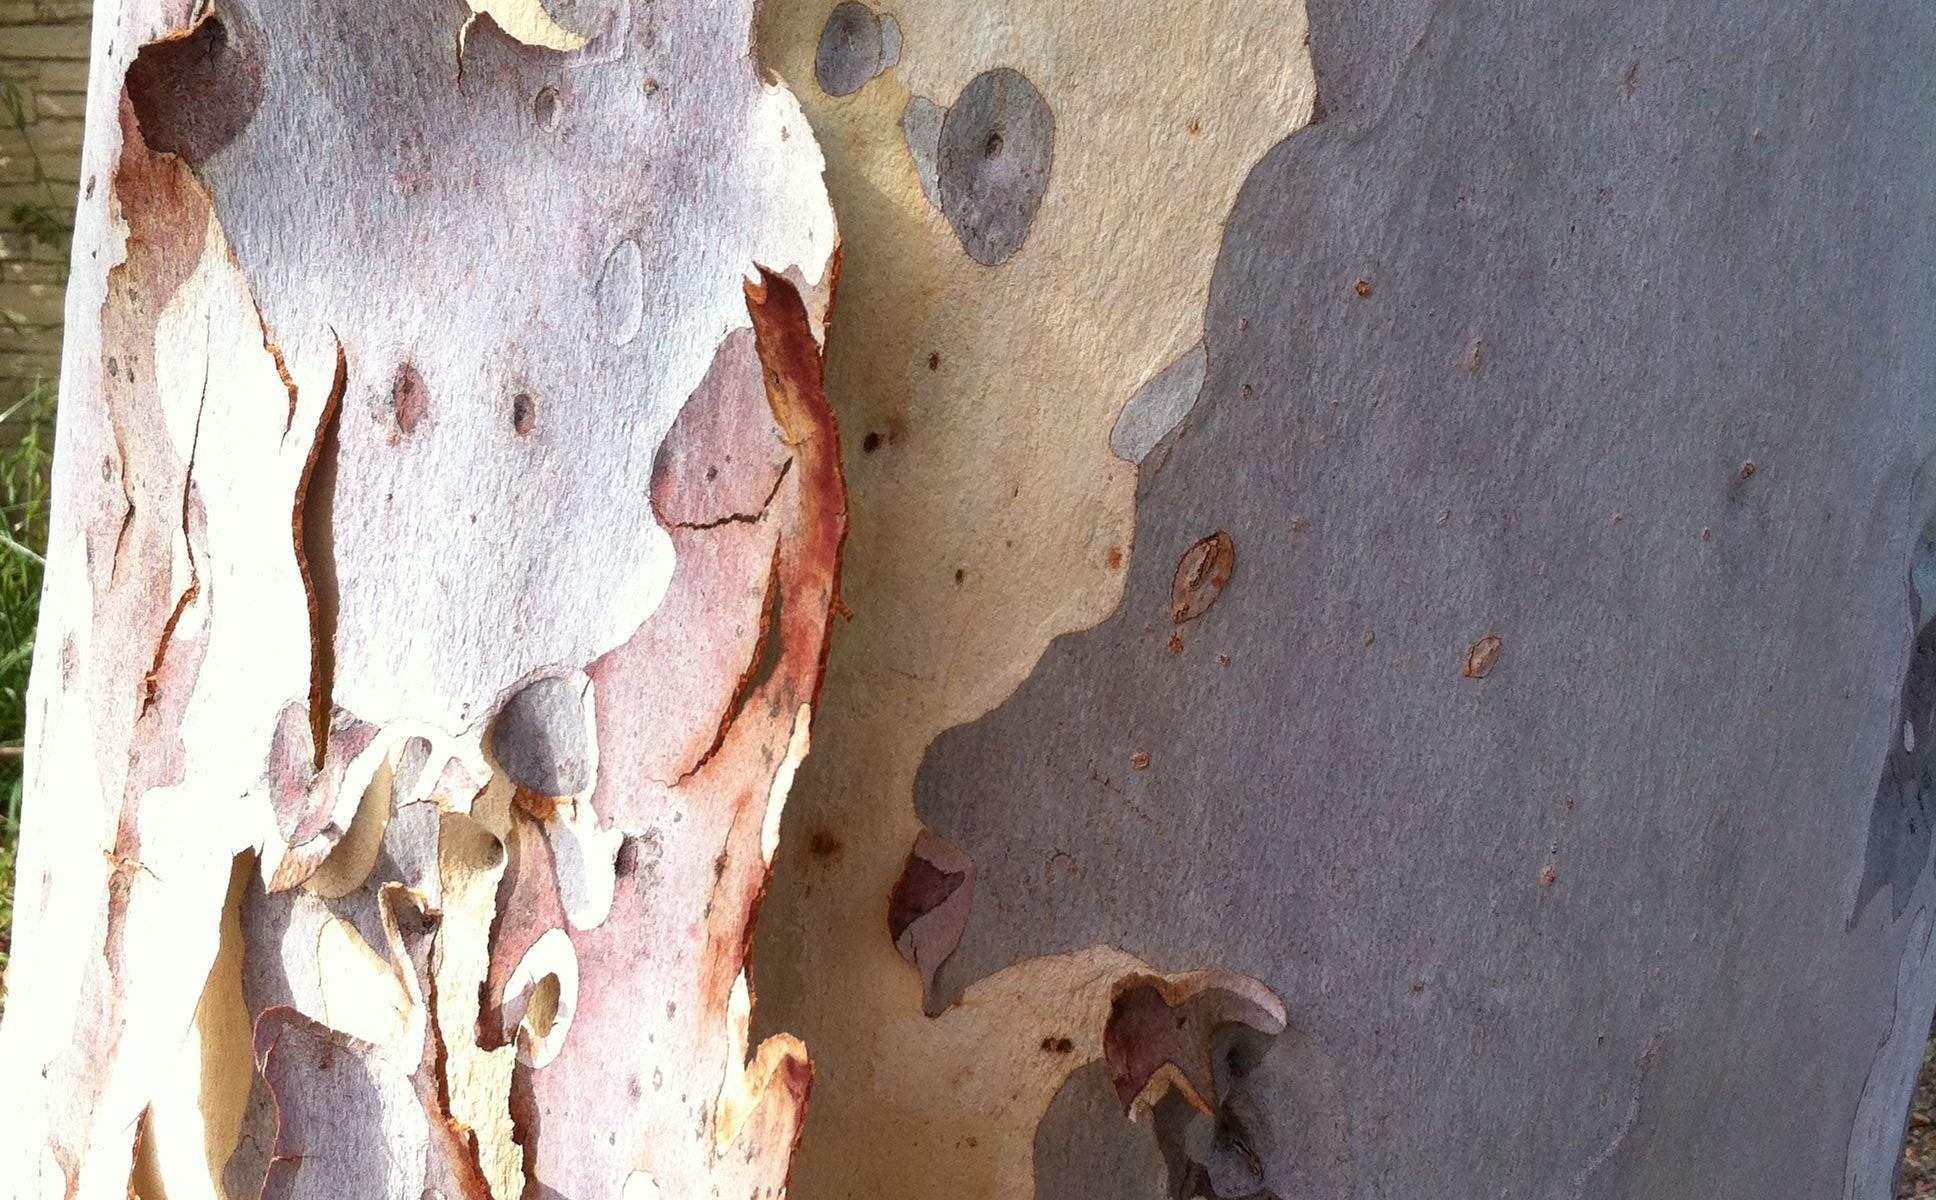 Peeling Bark on a SoCal Eucalyptus